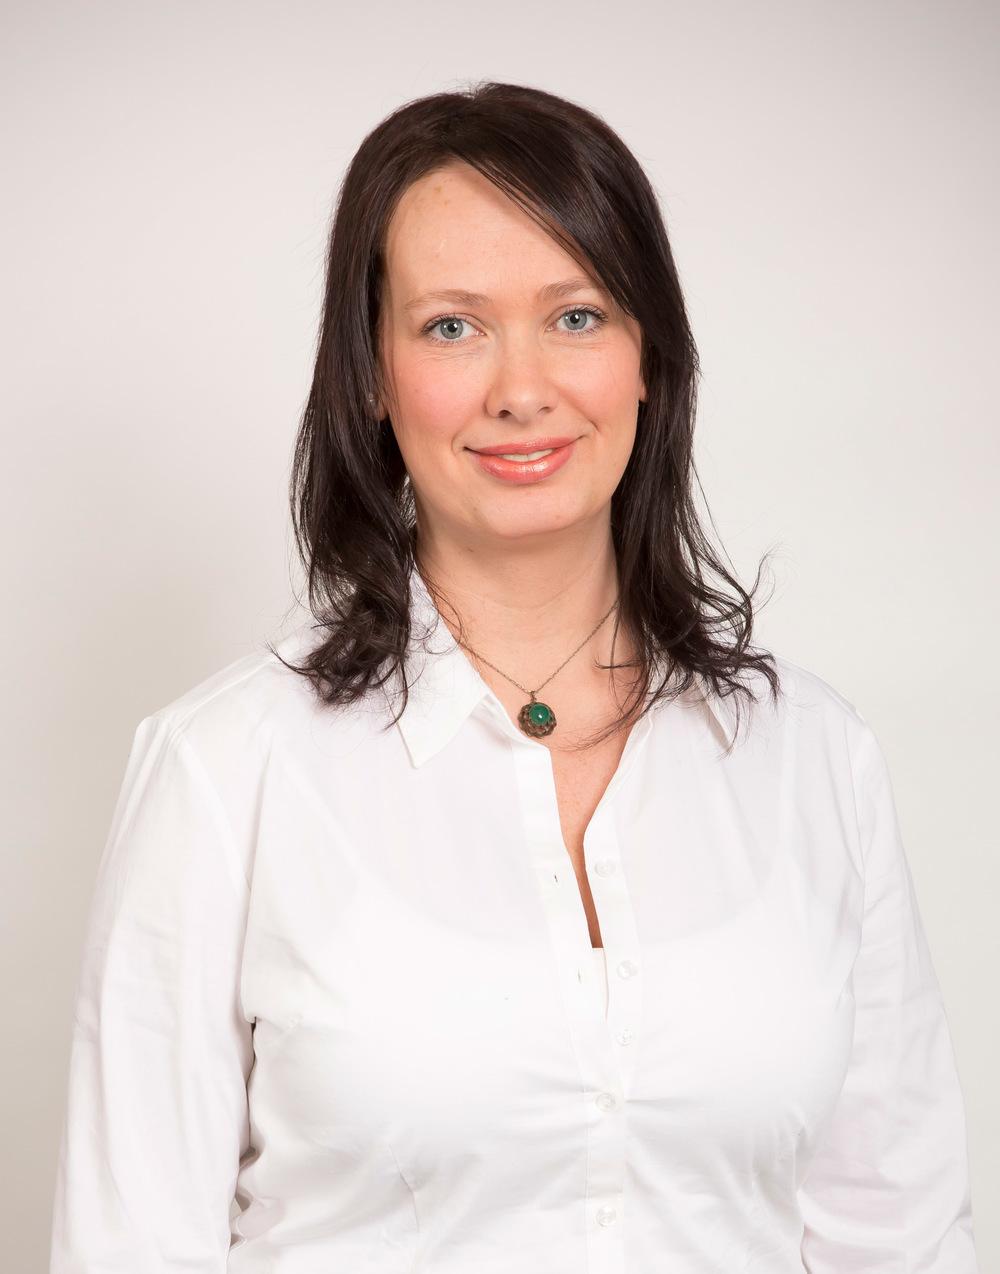 Kimberly Bond Office Administrator kbond@sipartners.net